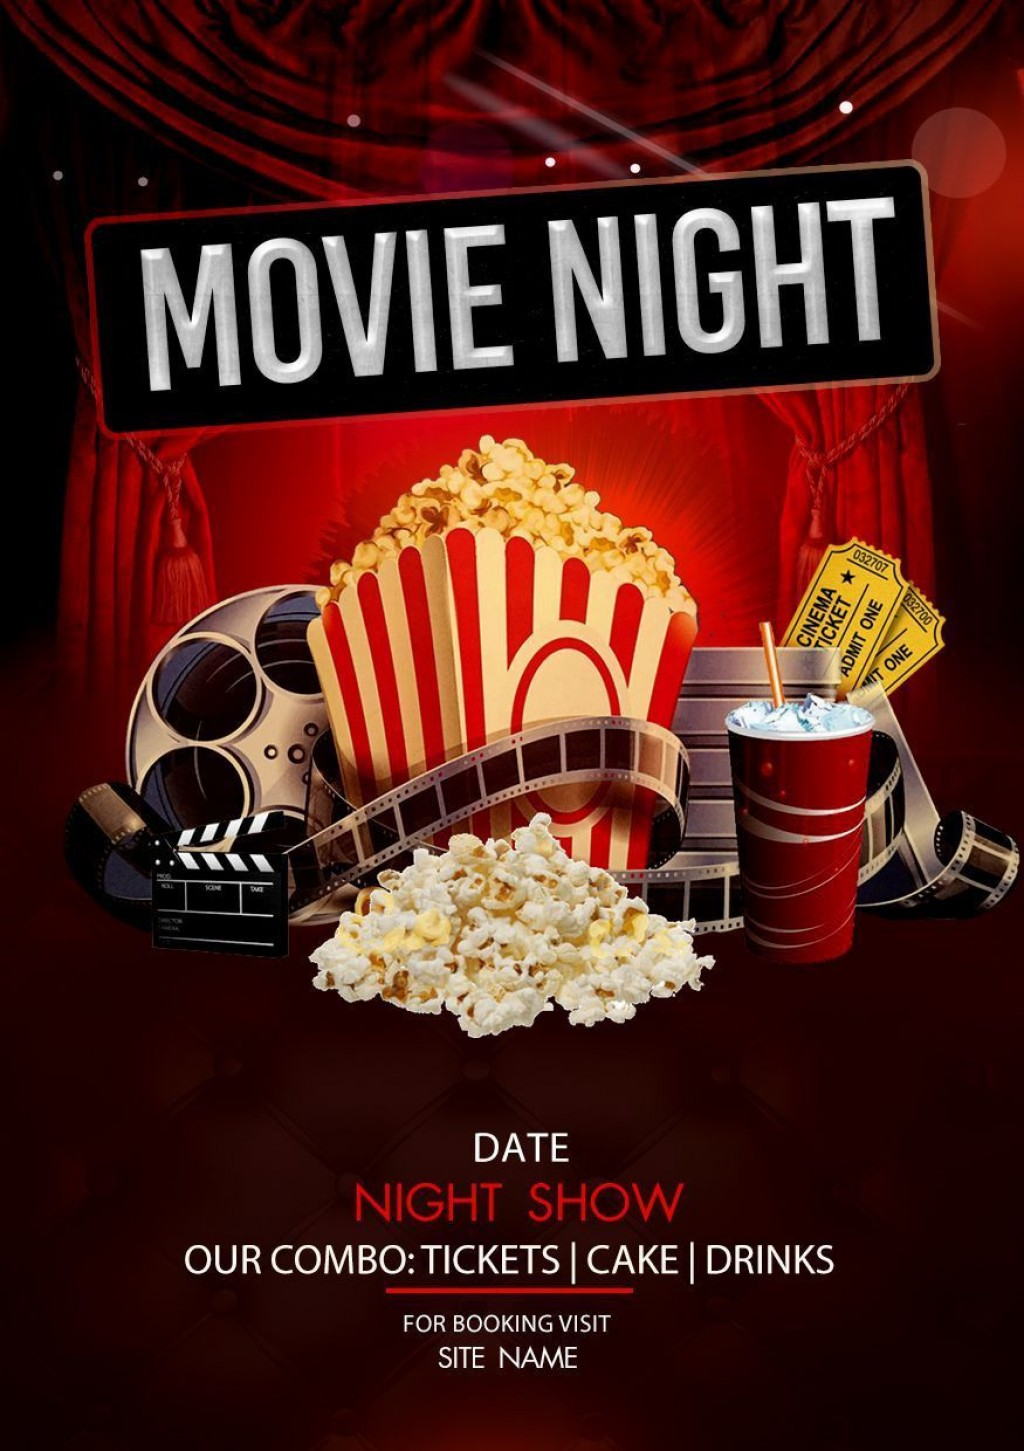 002 Dreaded Movie Night Flyer Template Image  Templates Free Microsoft WordLarge